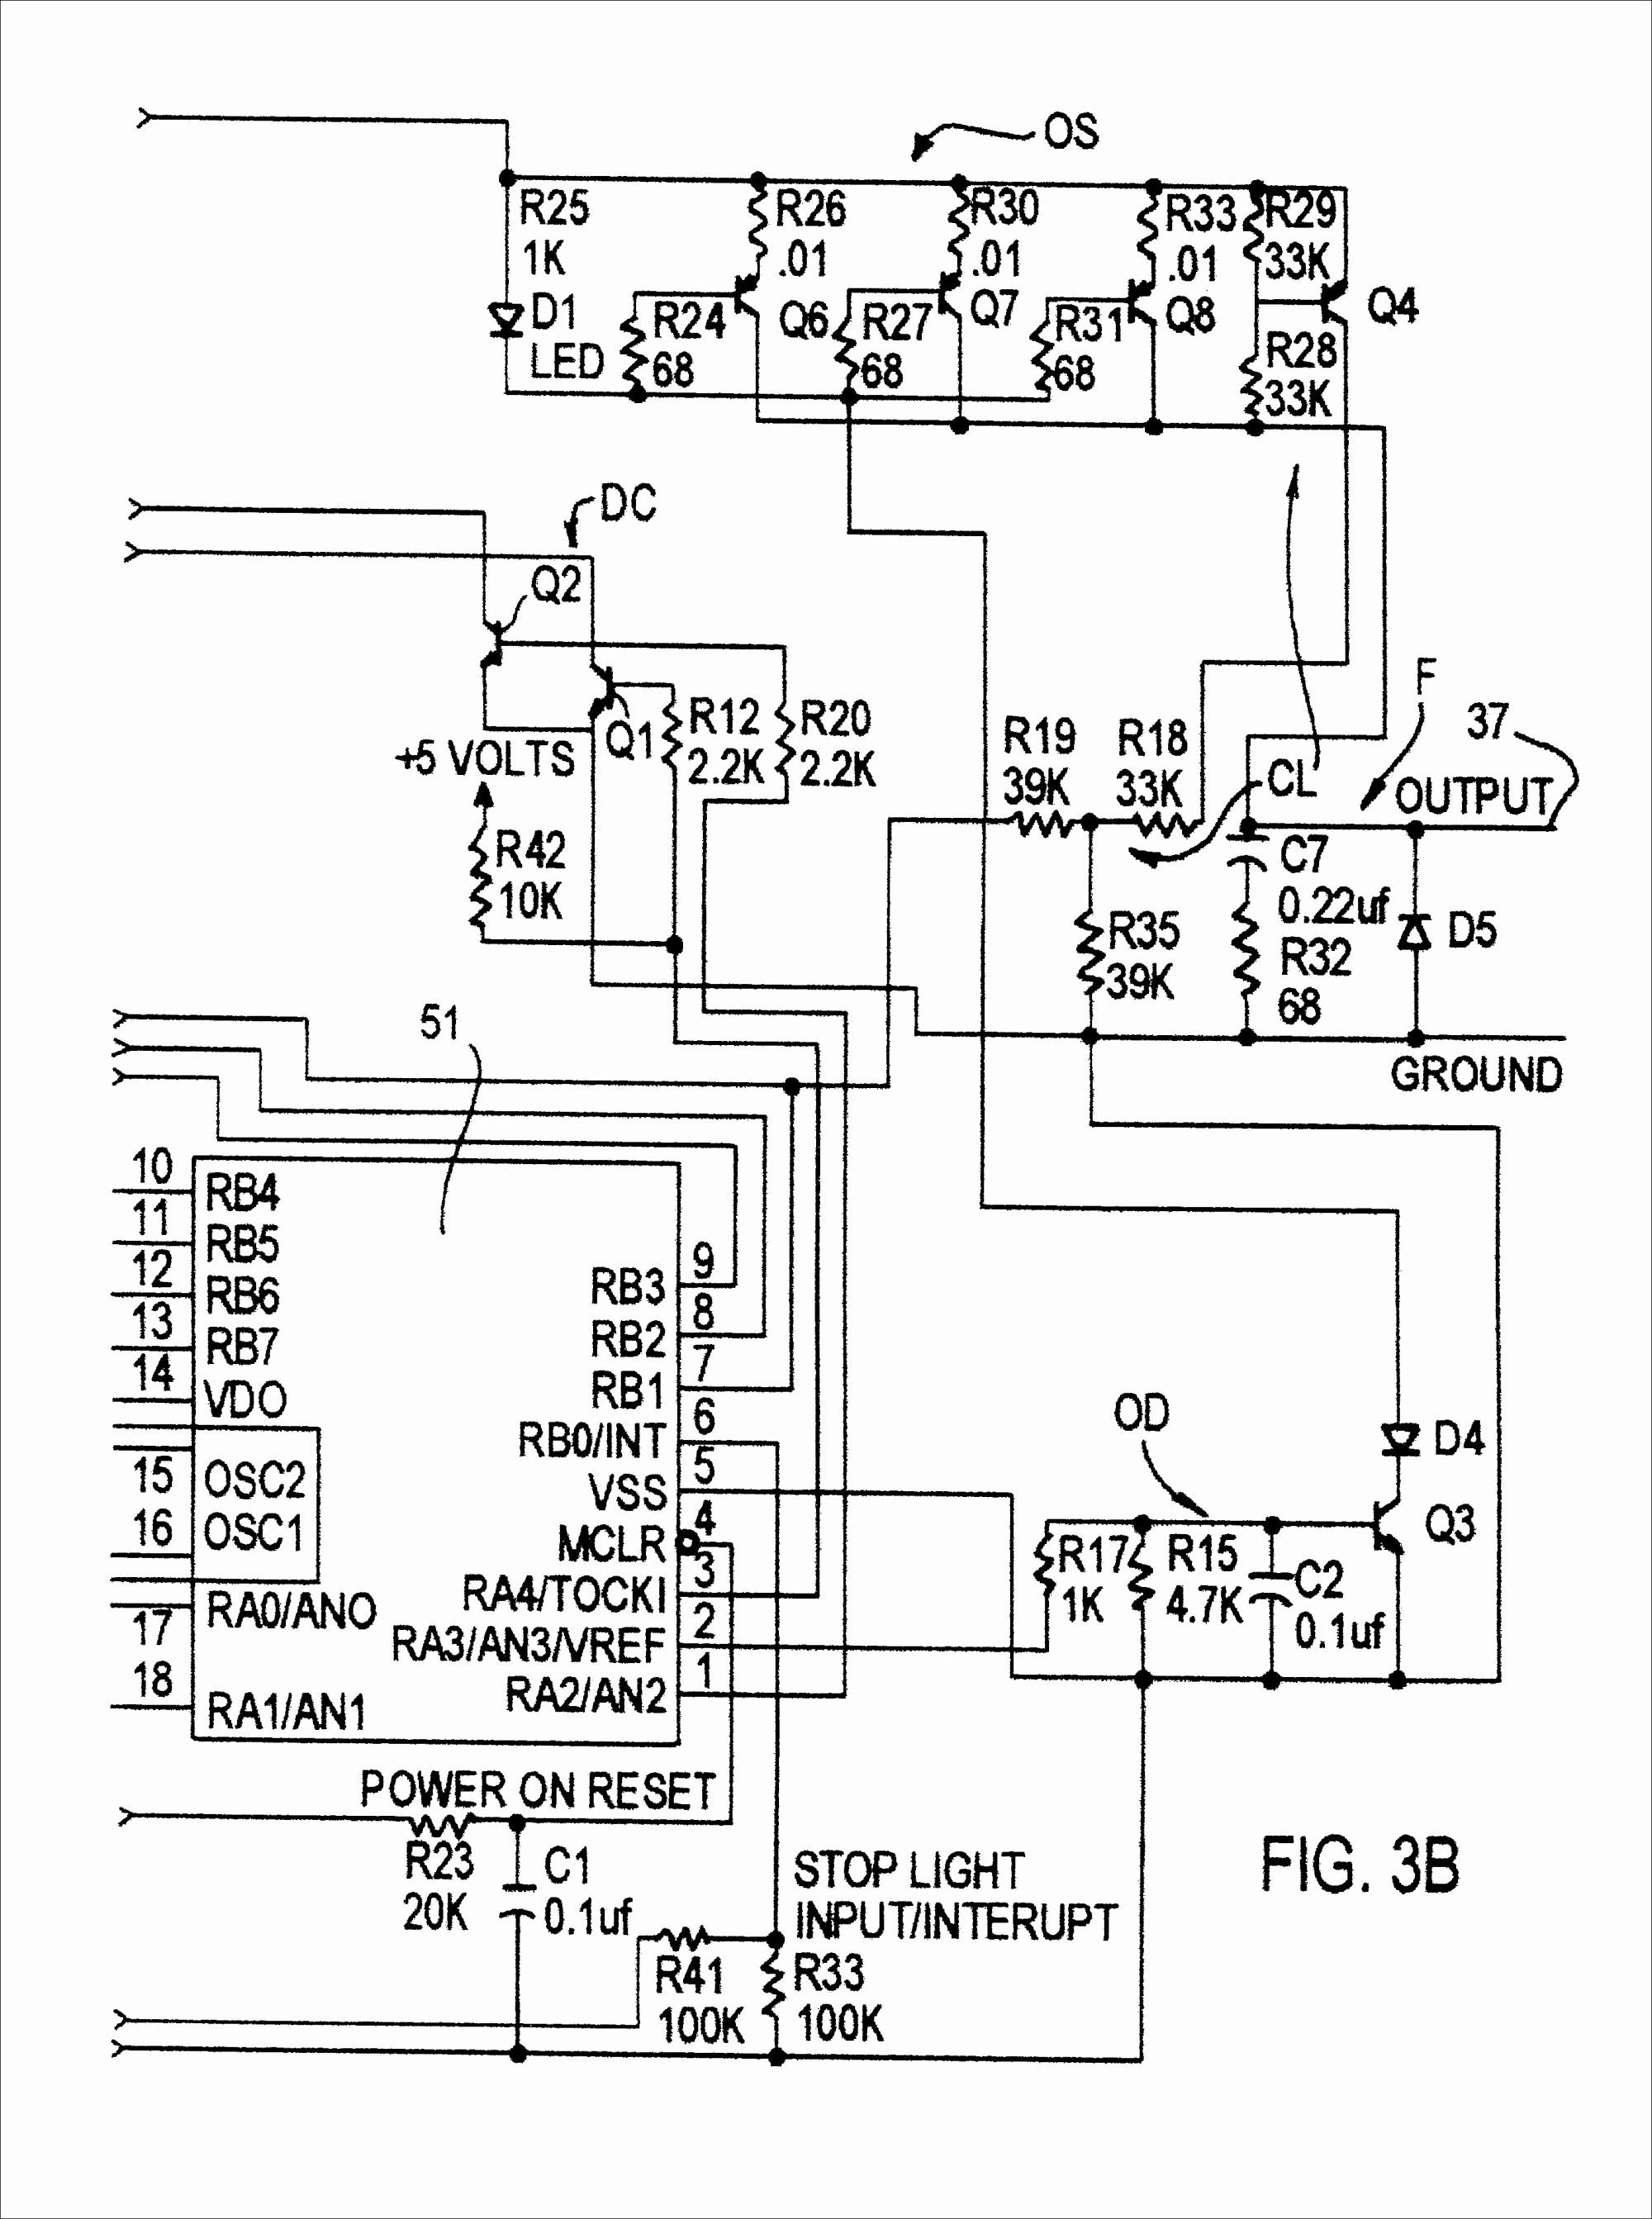 hight resolution of basic motorcycle engine diagram car engine schematics smart wiring diagrams of basic motorcycle engine diagram